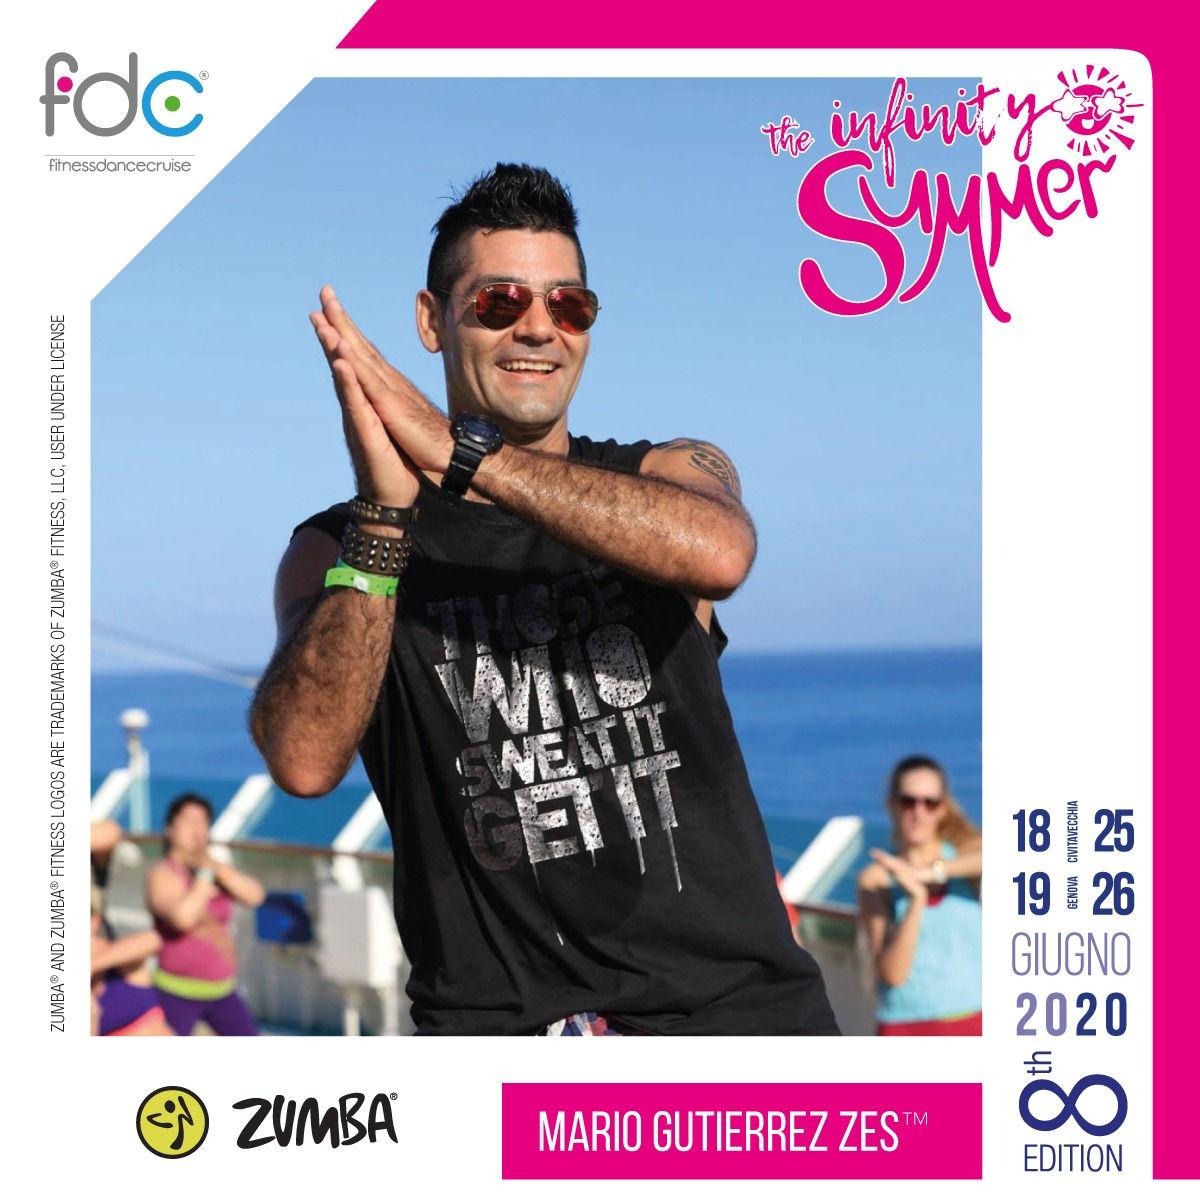 Zumba FDC Presenter Mario Gutierrez ZES